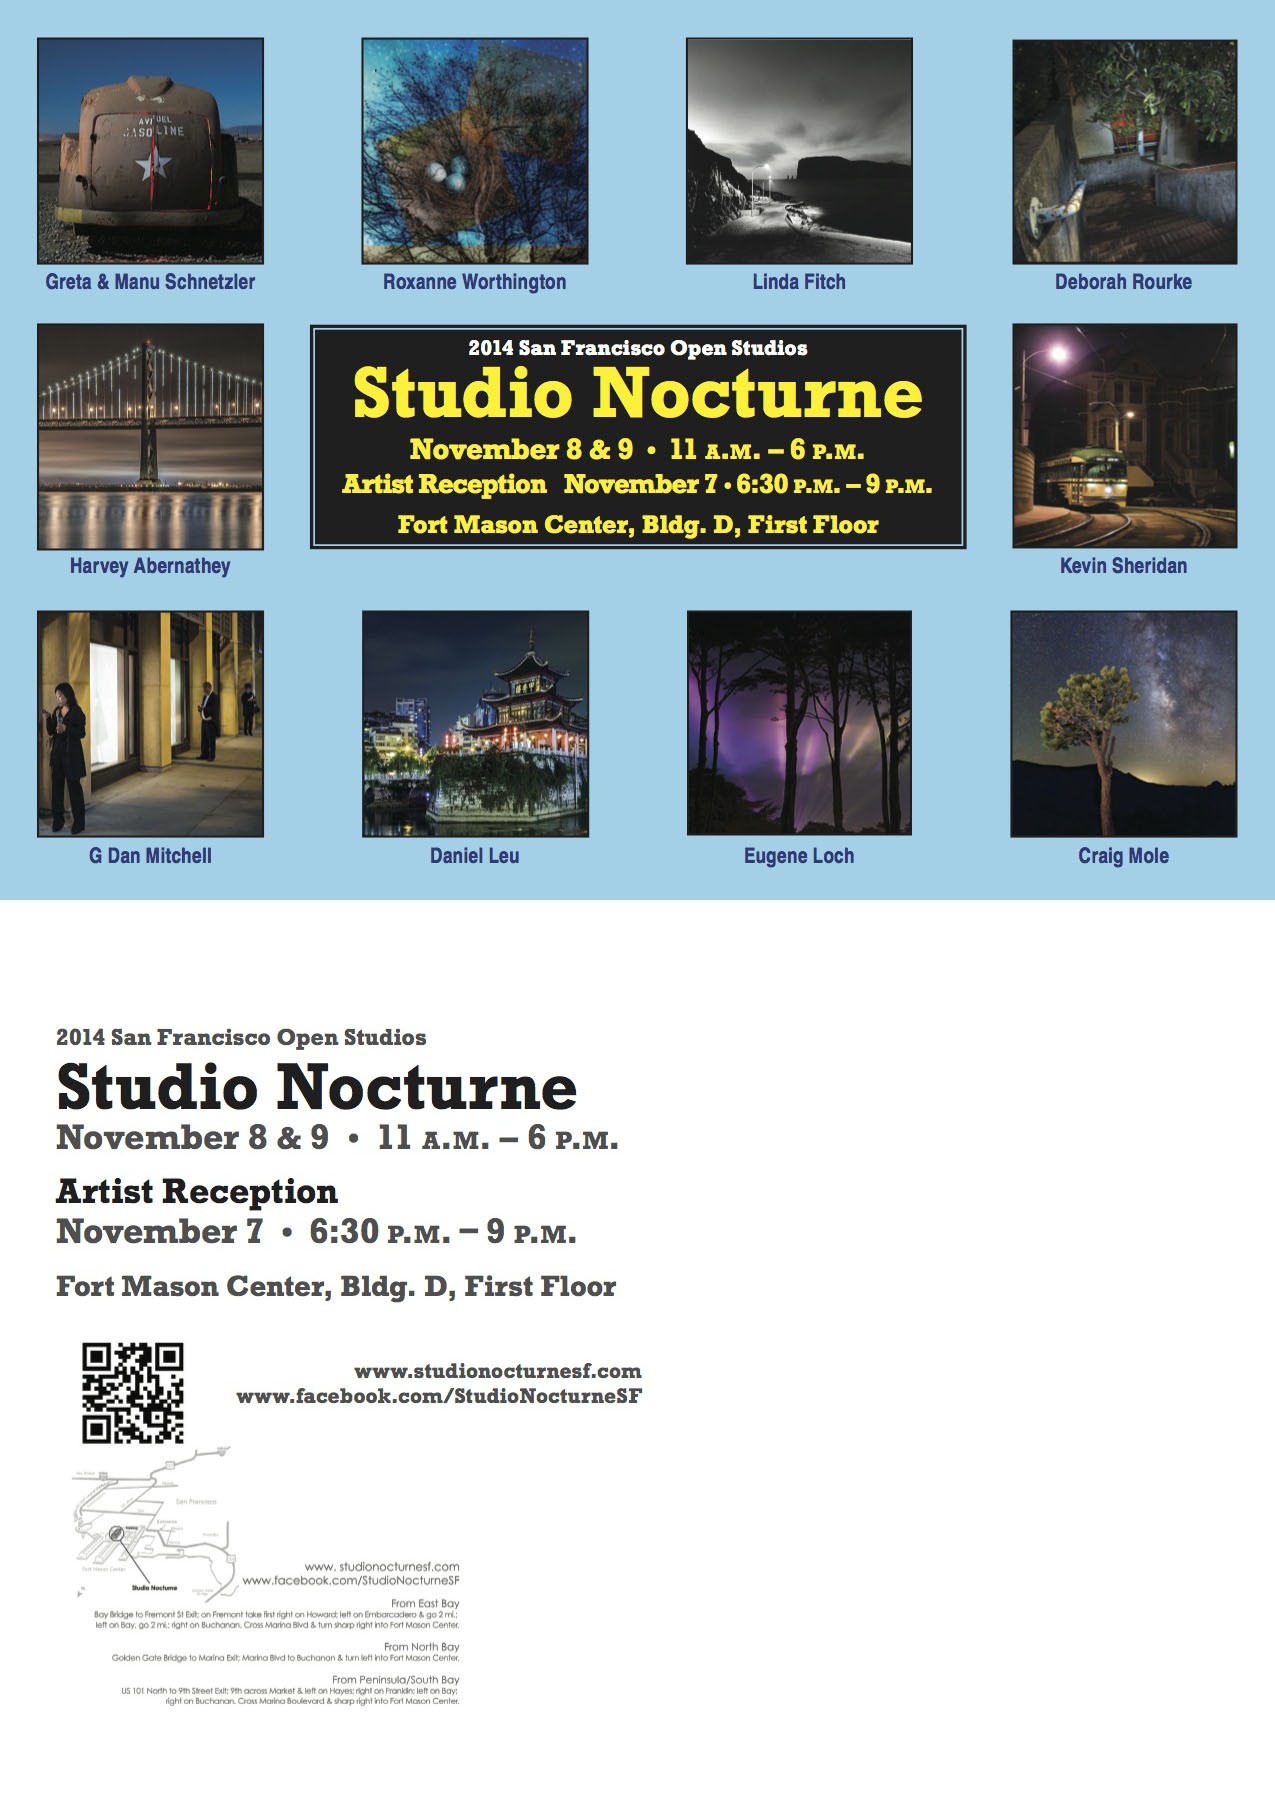 2014 San Francisco Open Studios